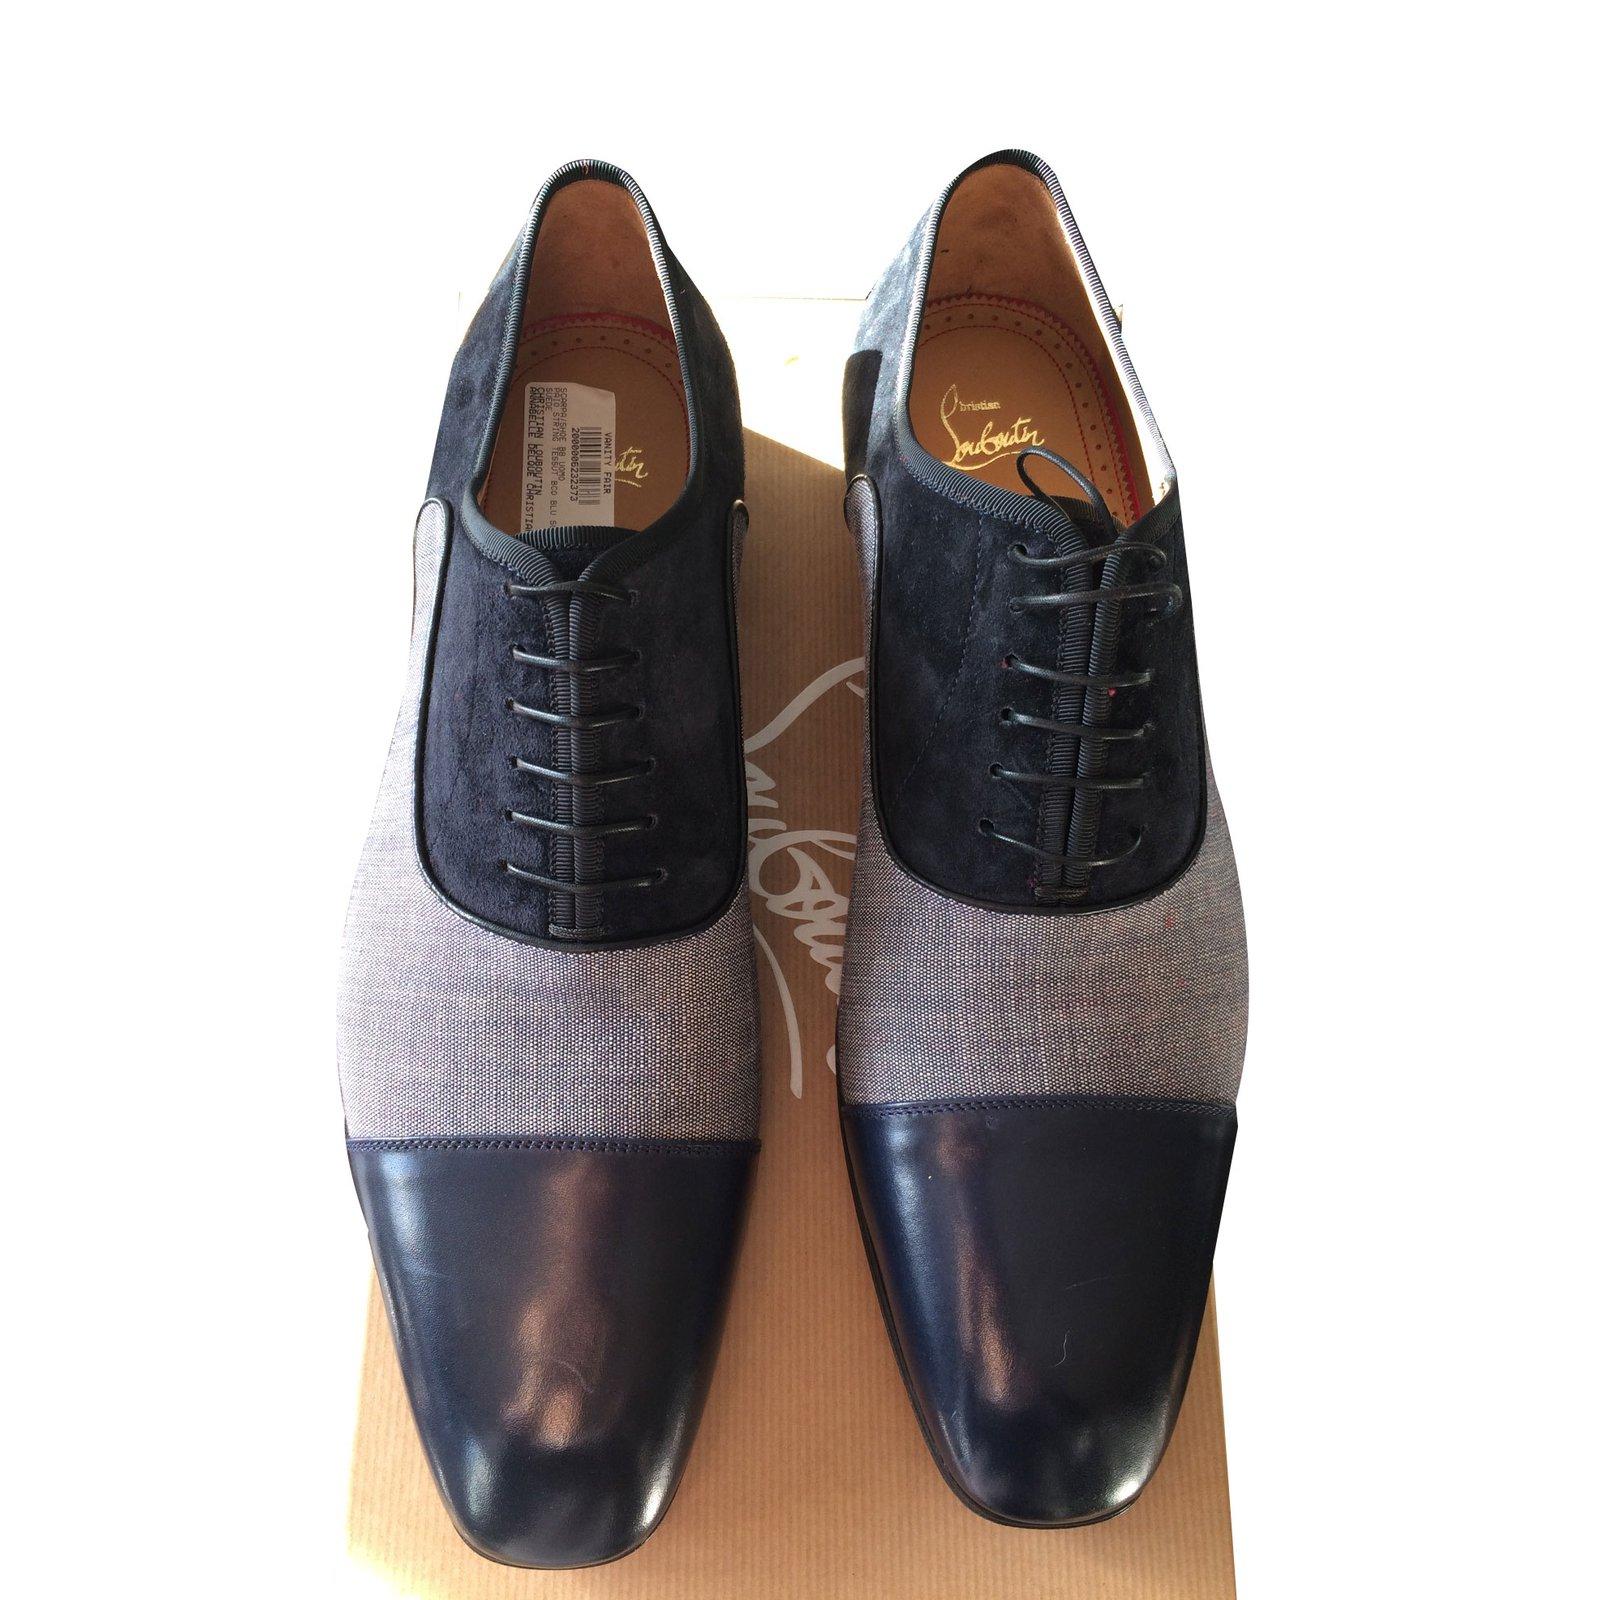 Christian Louboutin Shoes Lace ups